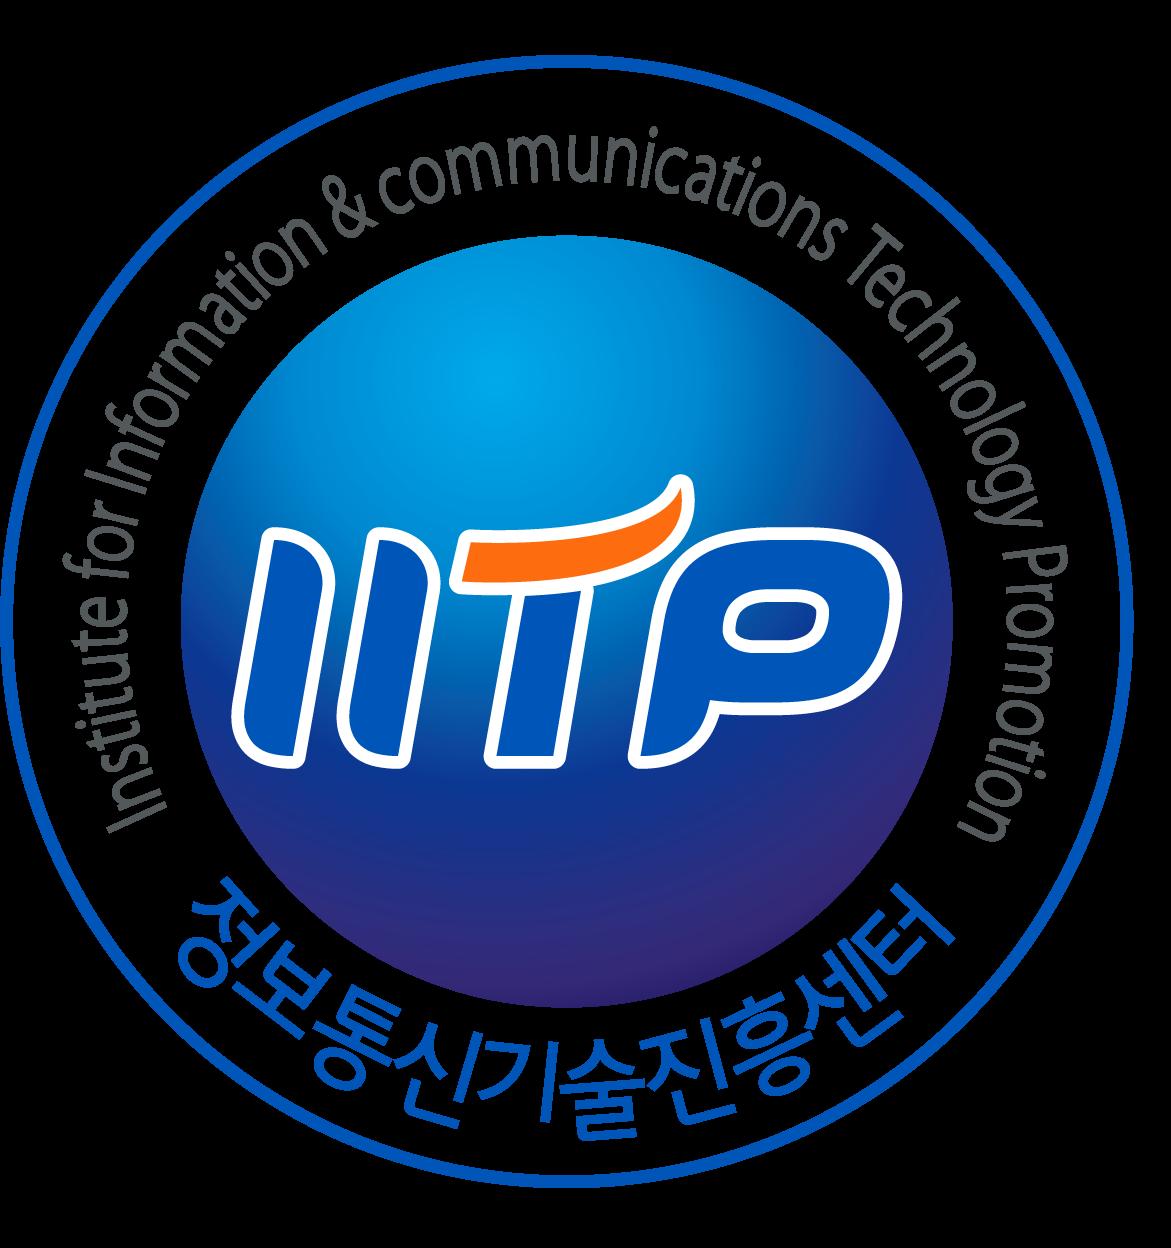 Go to IITP